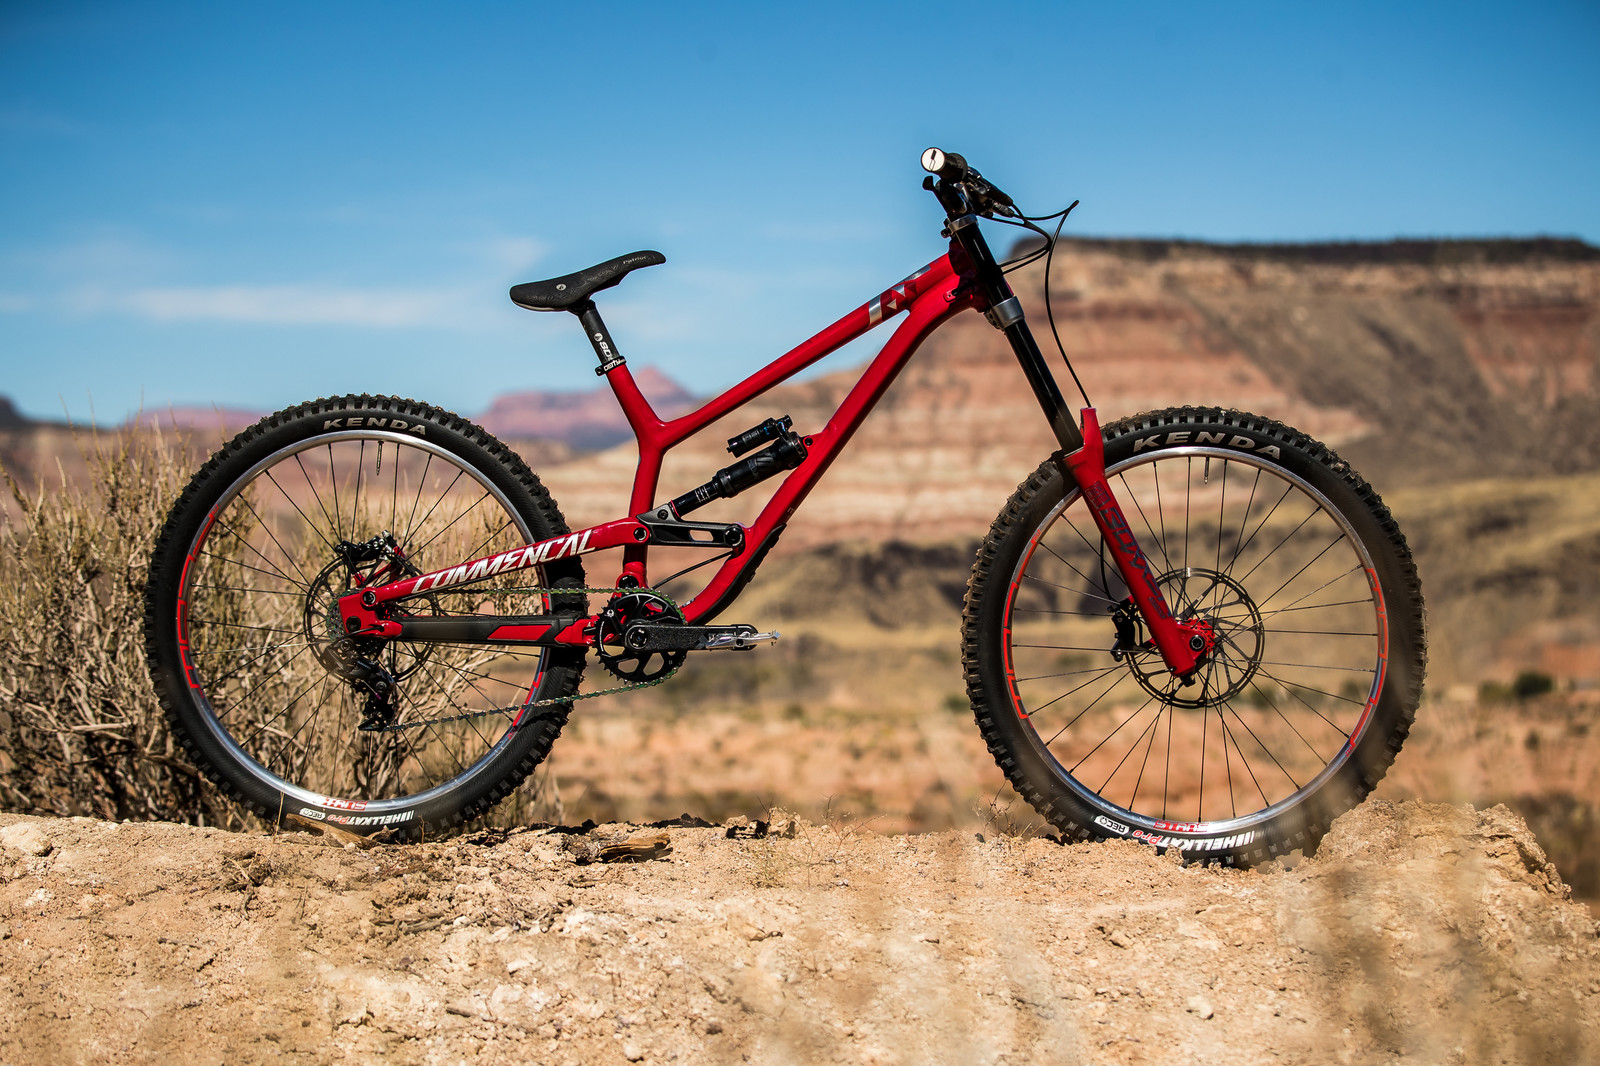 RAMPAGE BIKE - Kyle Strait's Commencal Furious - RAMPAGE BIKE - Kyle Strait's Commencal Furious - Mountain Biking Pictures - Vital MTB